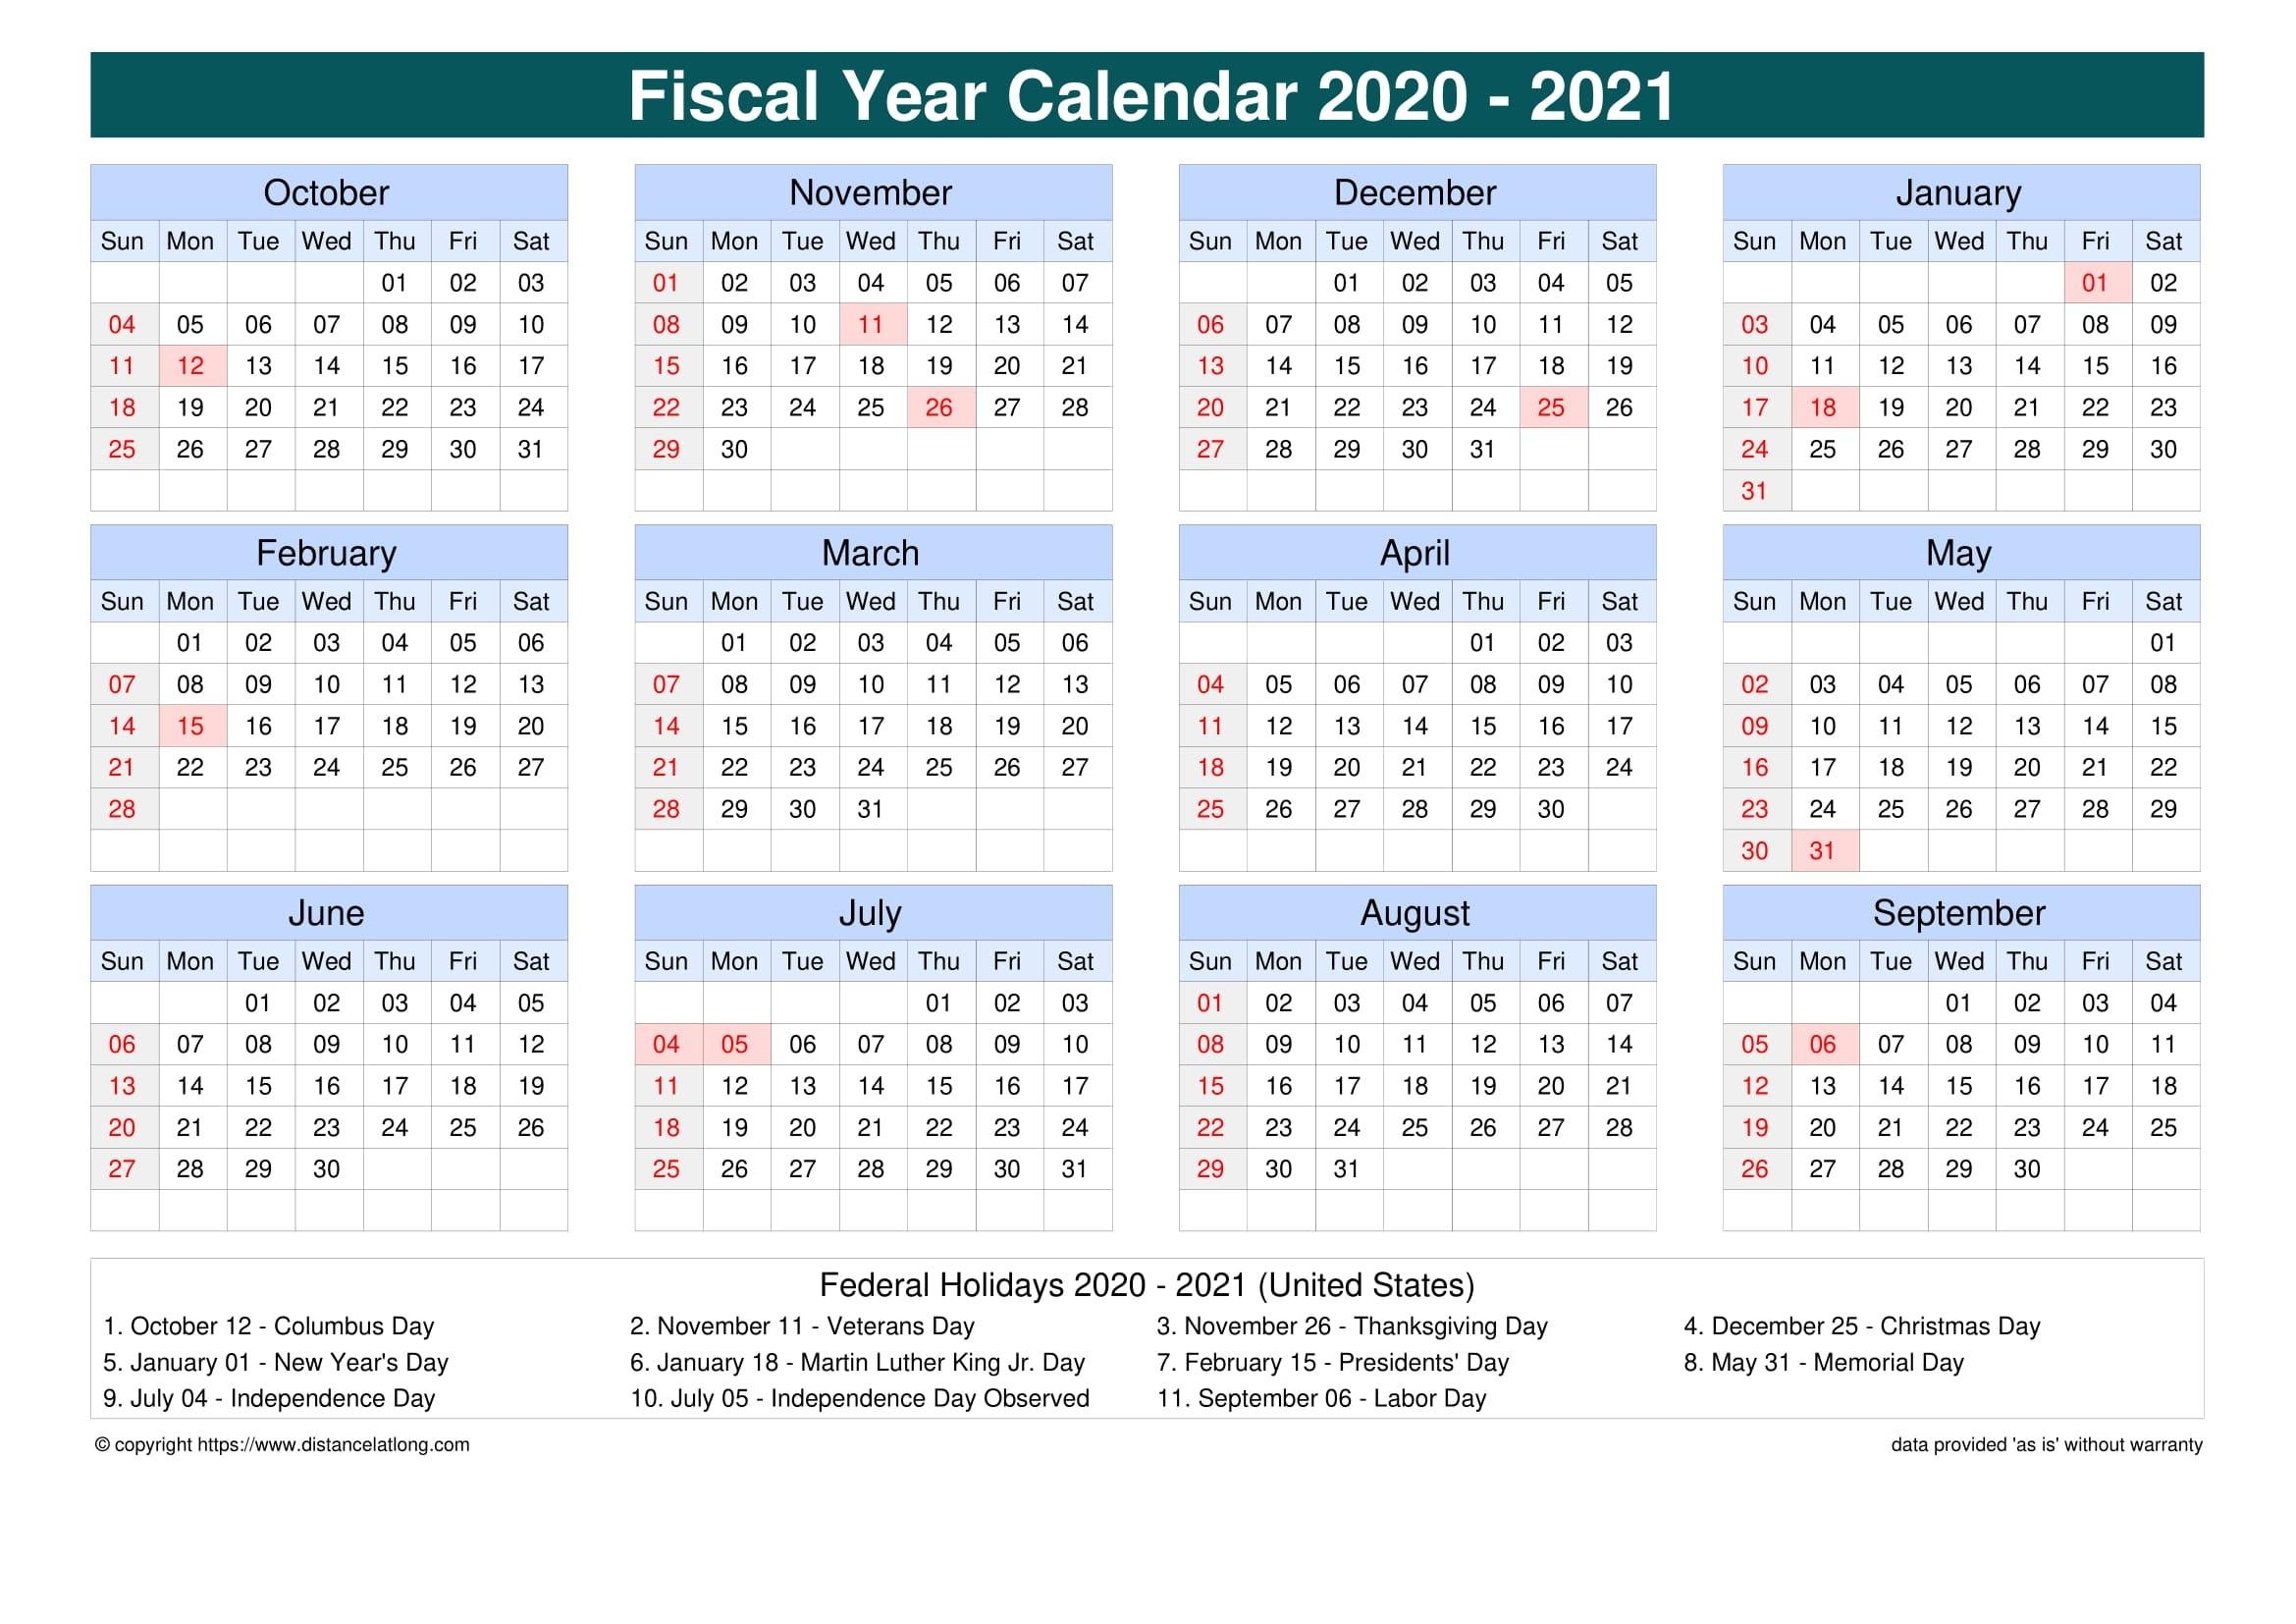 2020 Australia Holiday Calendar Australia Portrait  18 19 Financial Year Dates Australia